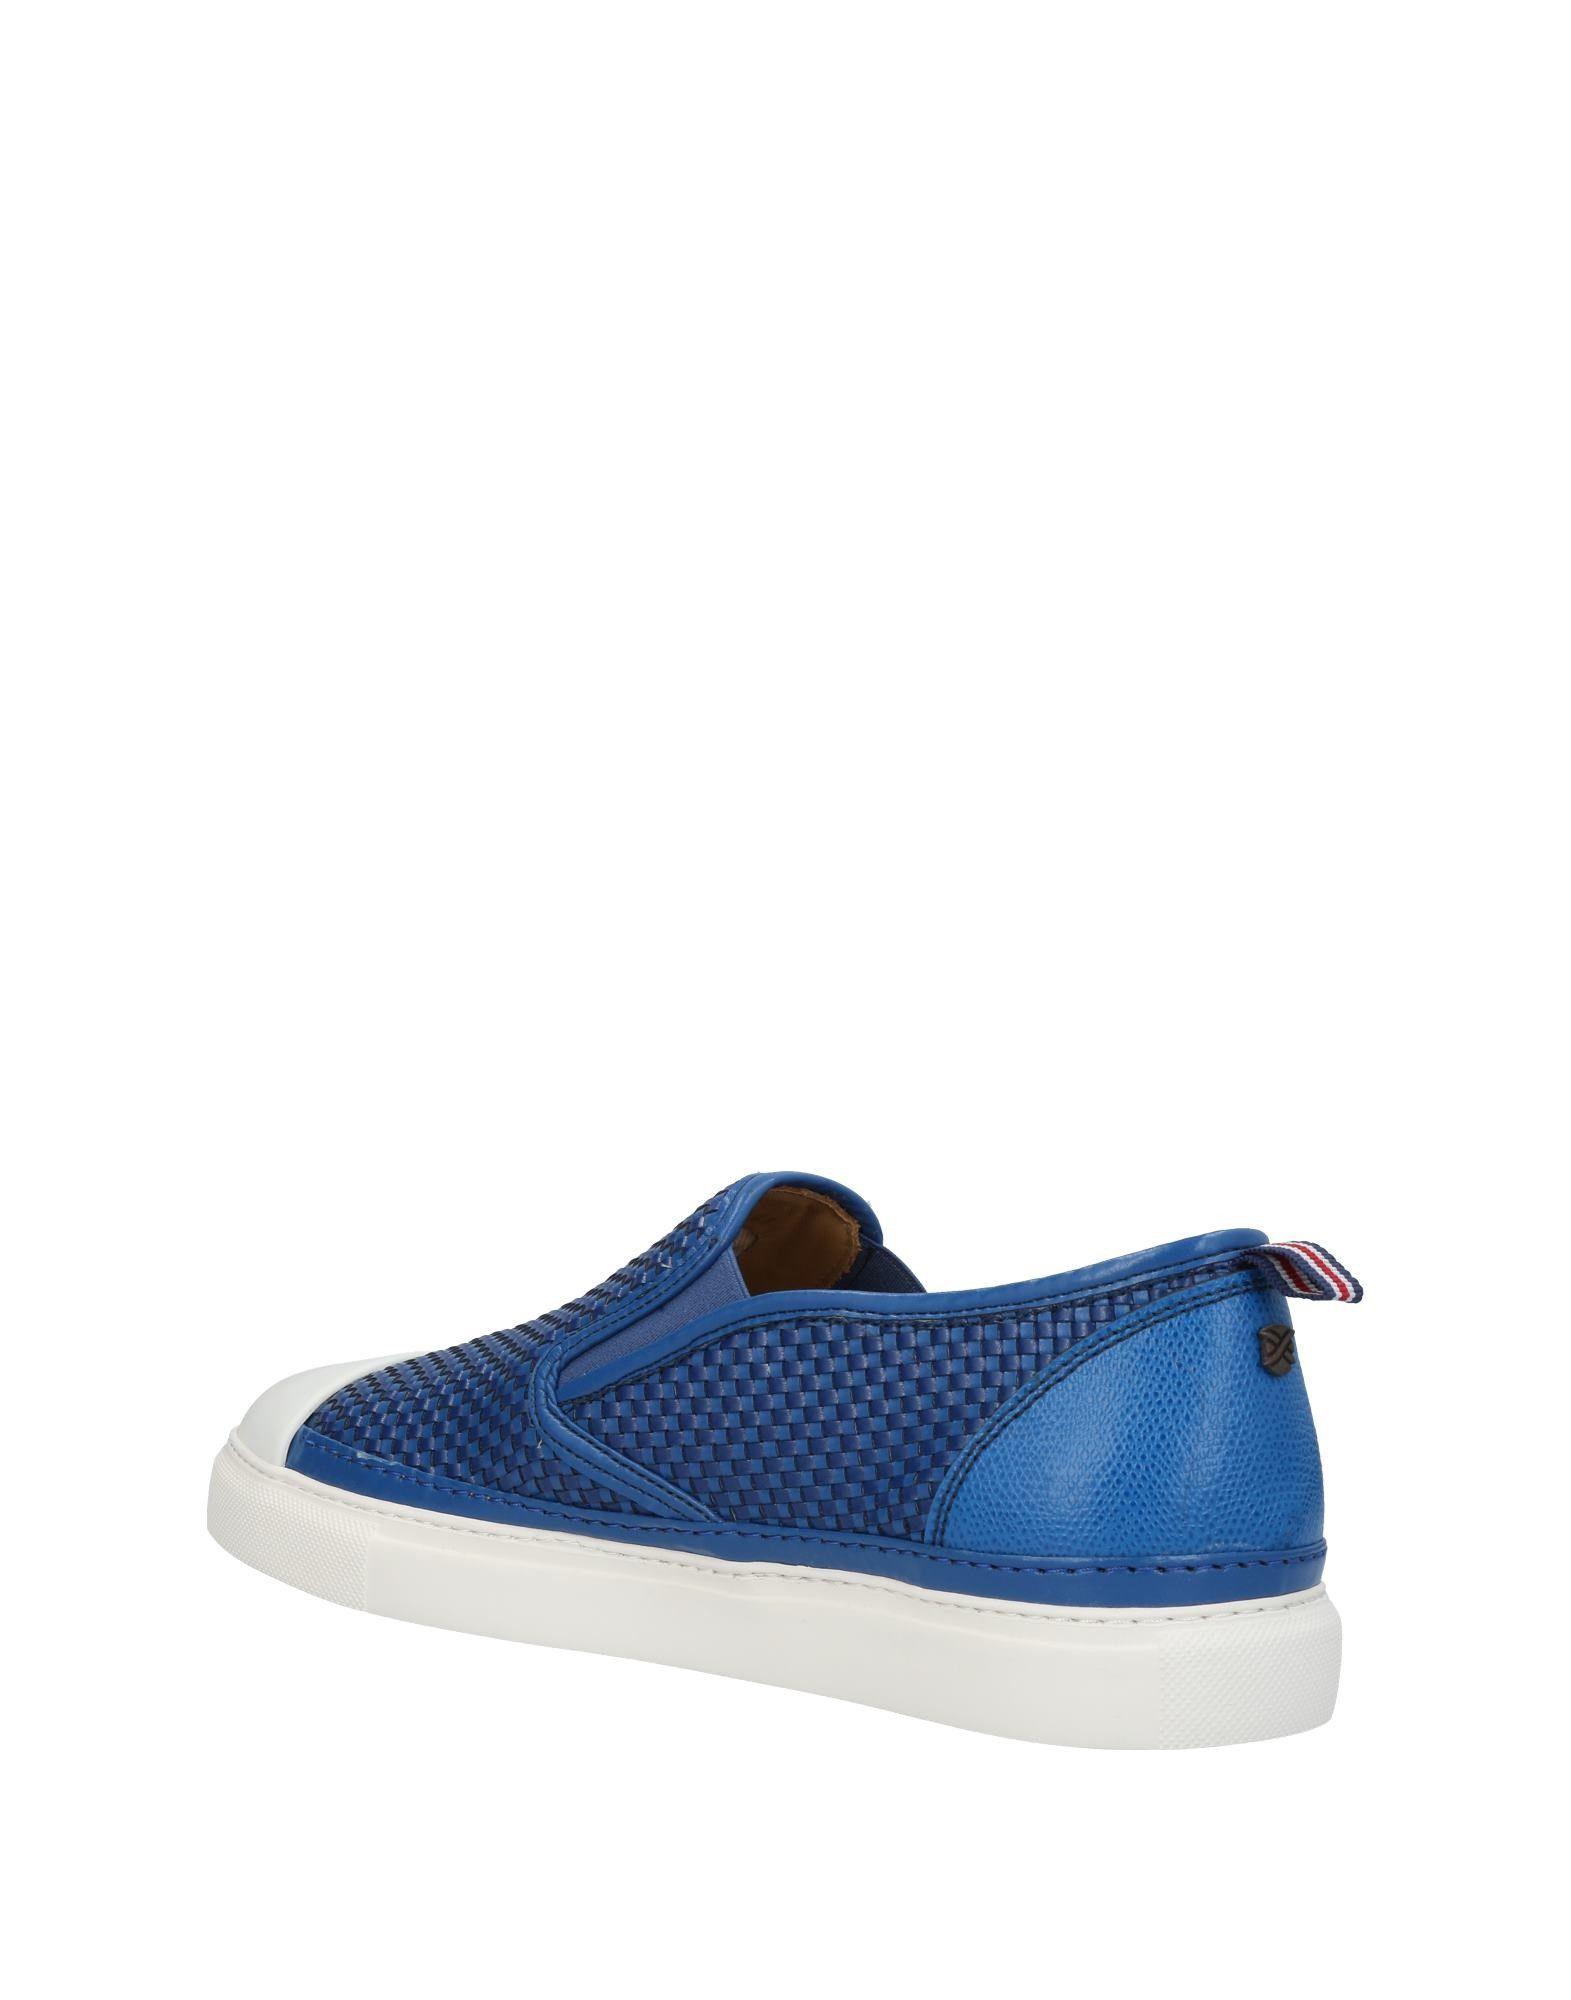 Sneakers Brimarts Homme - Sneakers Brimarts sur